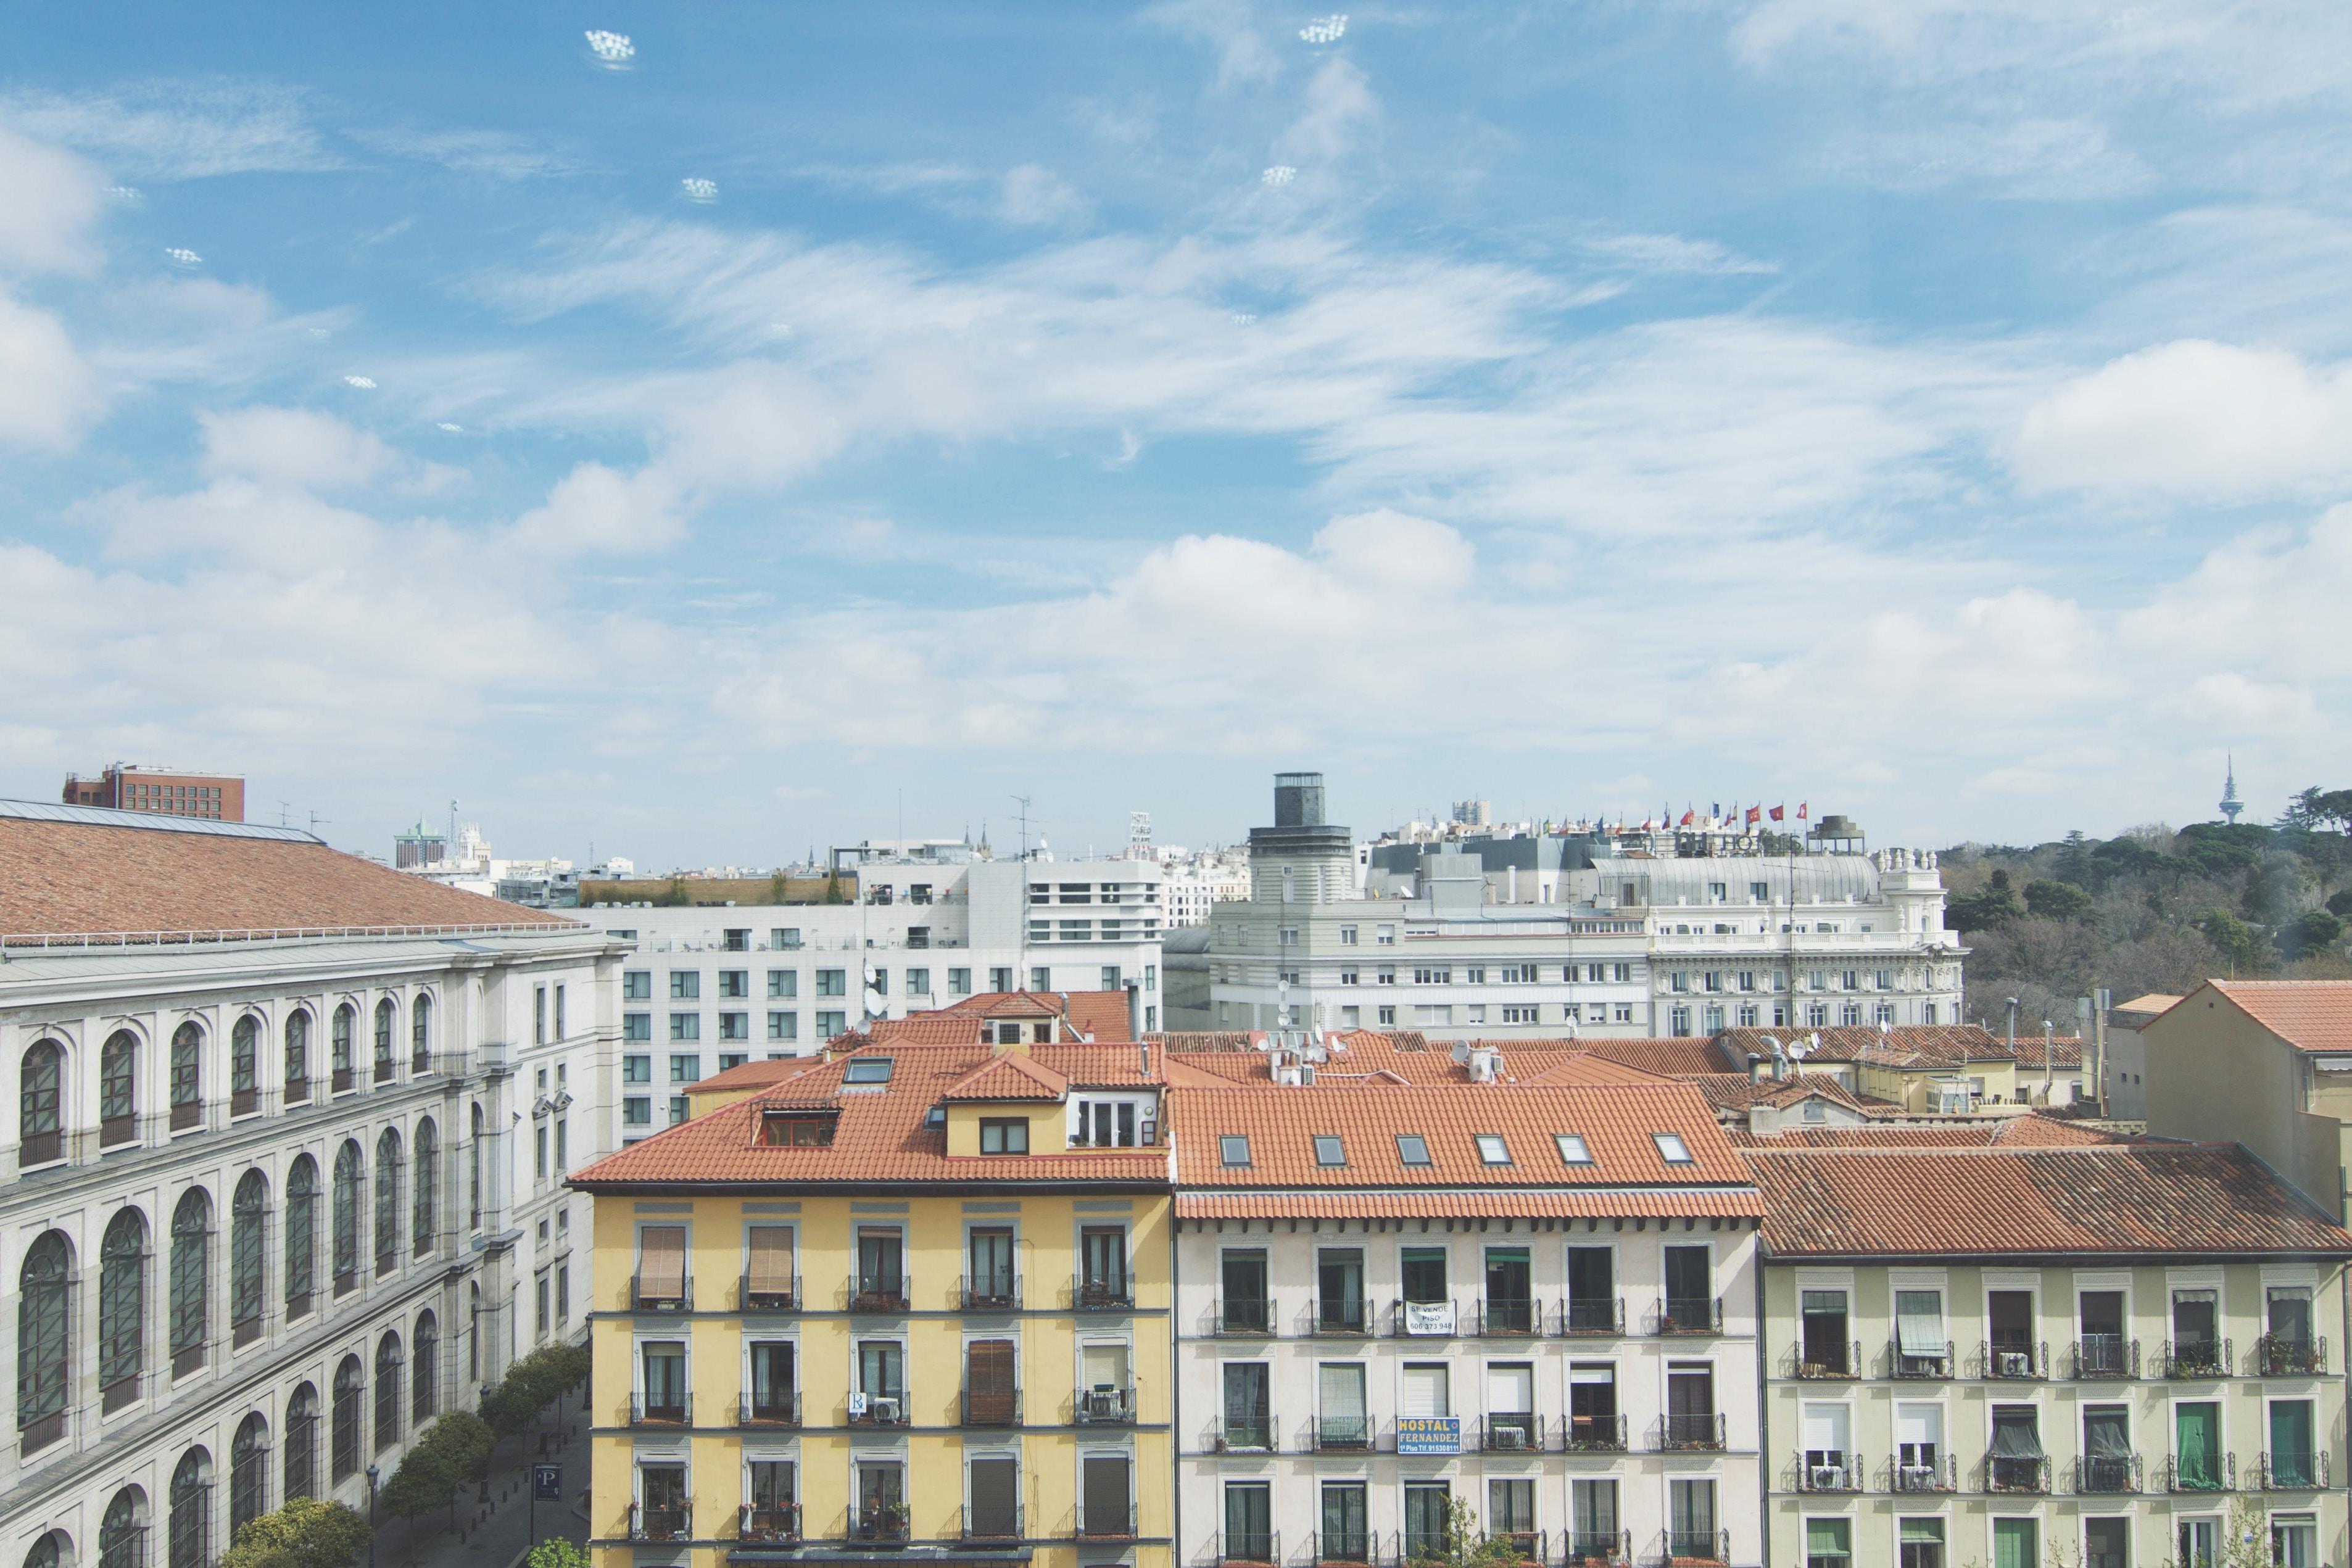 Long shot of blue sky and downtown building architecture, Museo Nacional Centro de Arte Reina Sofía